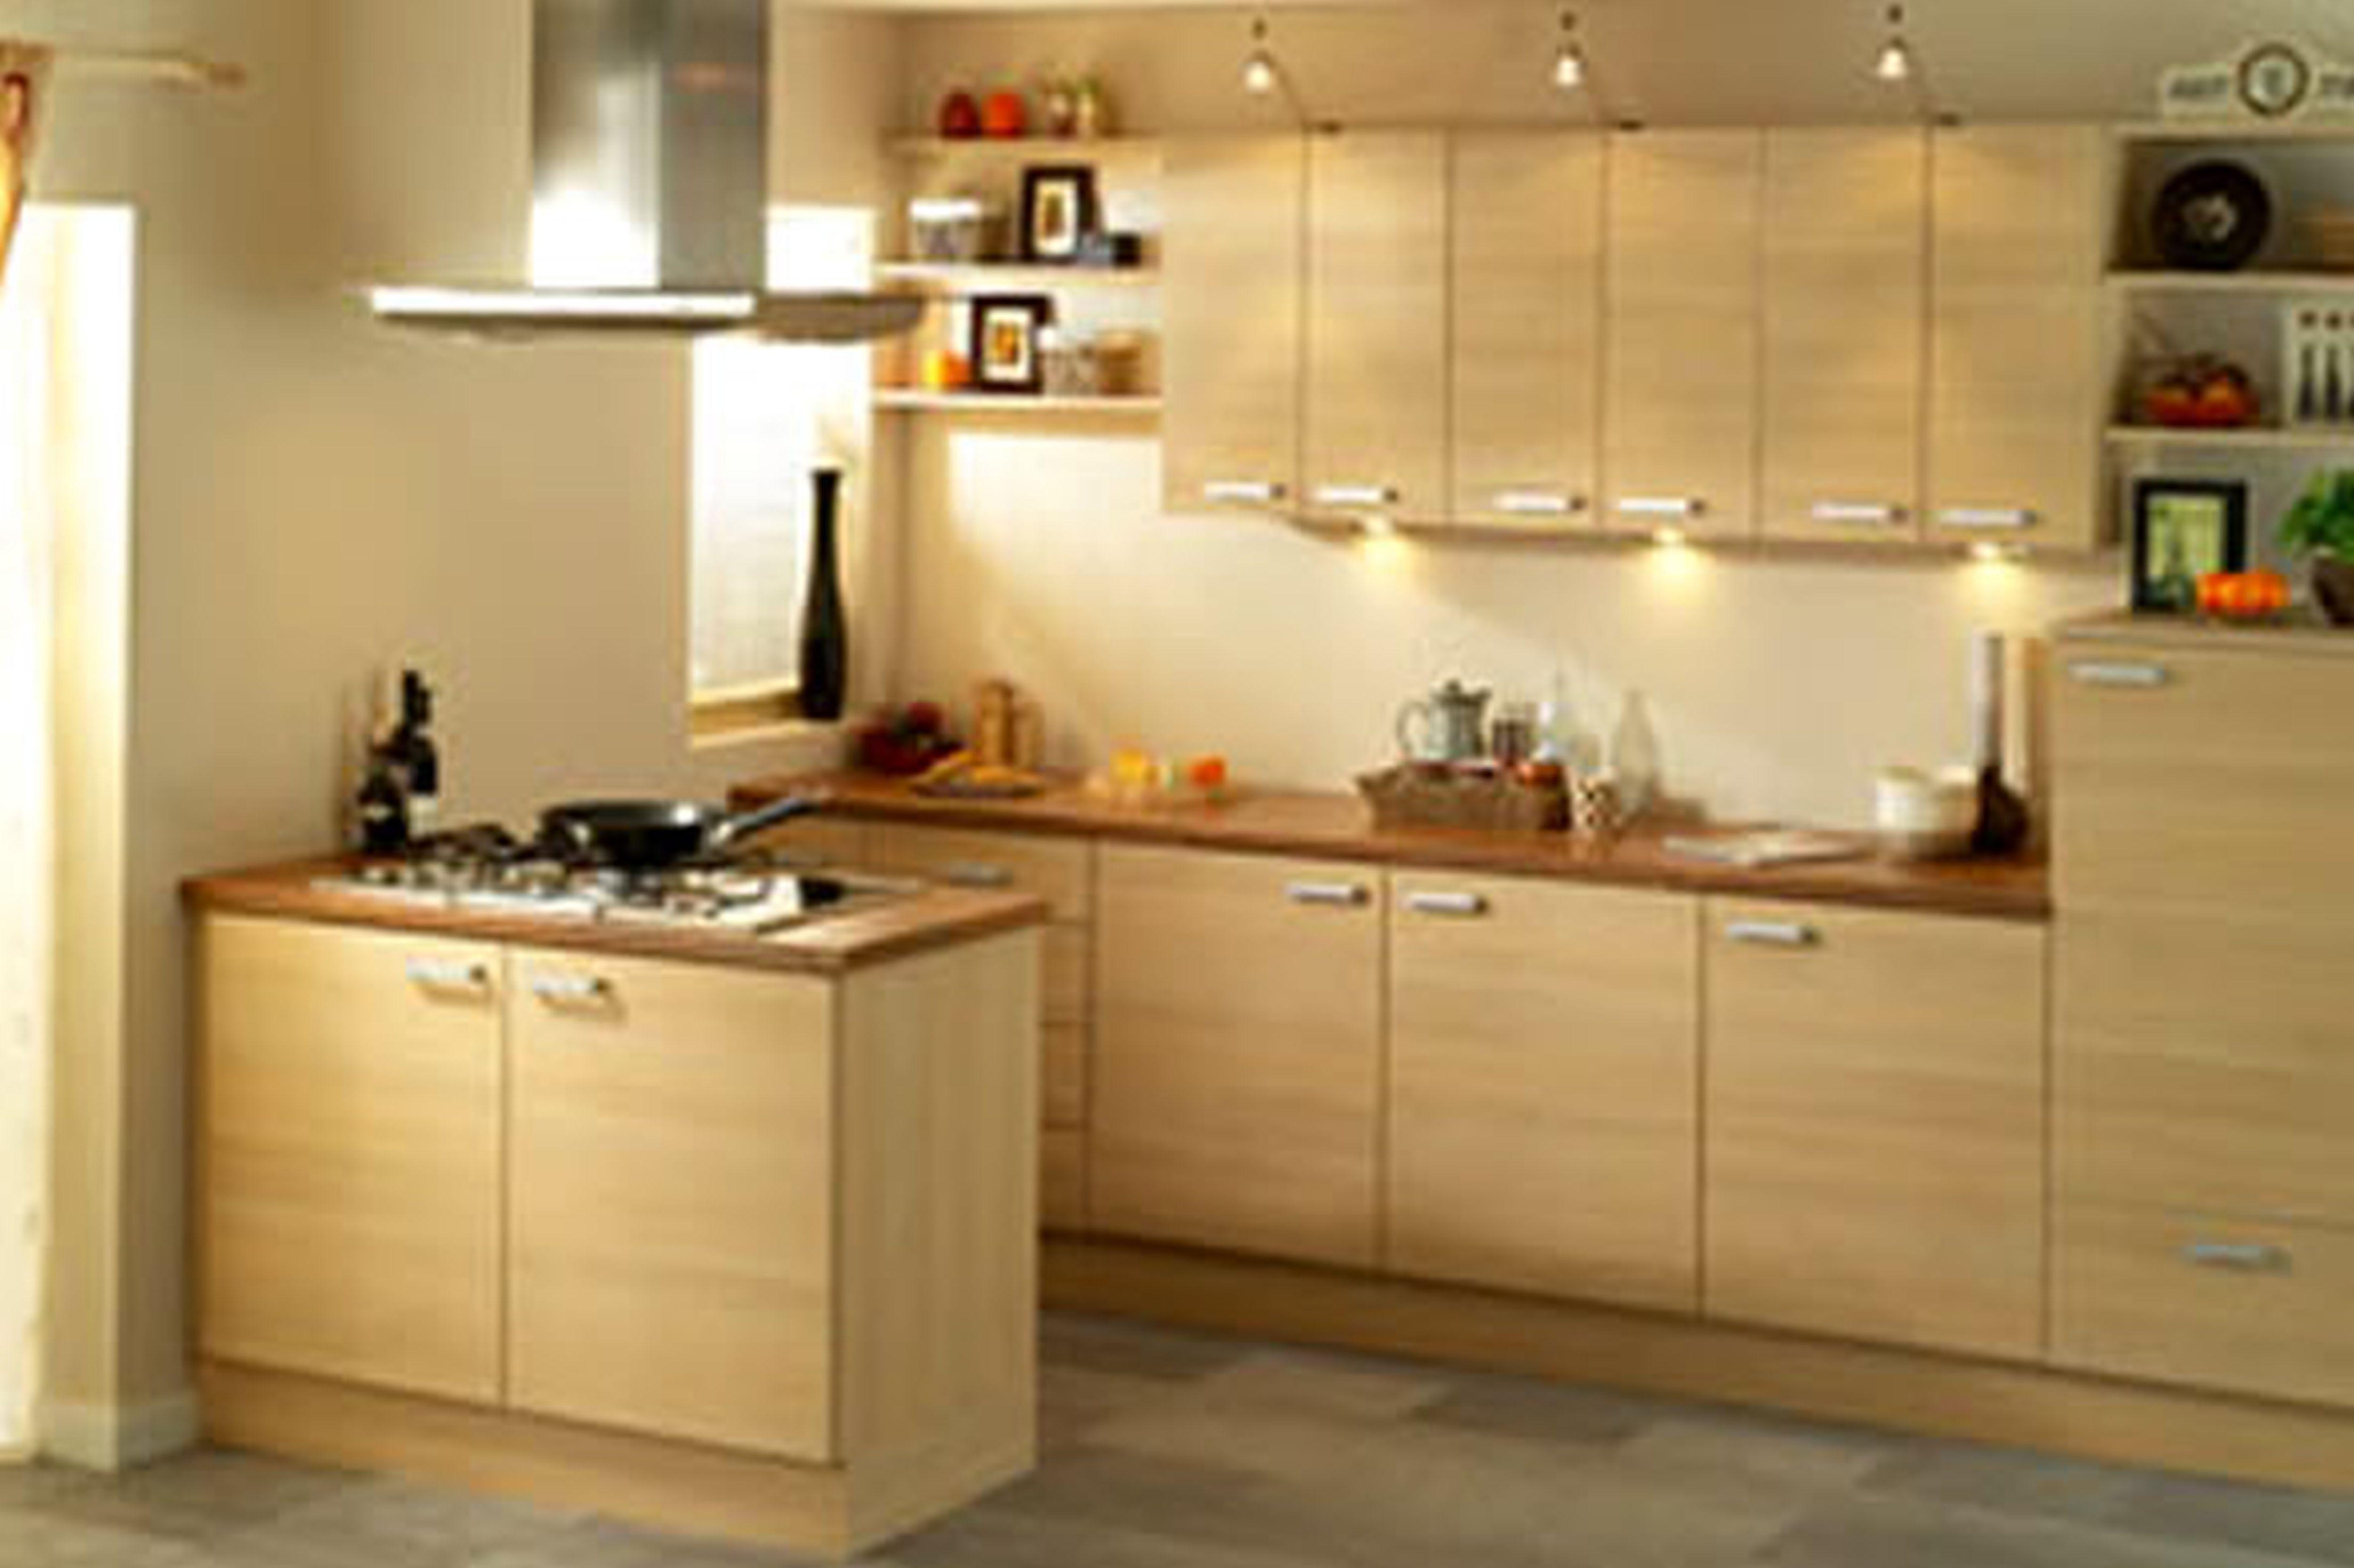 Amazing Tiny House Kitchen Design Ideas For You Simple Kitchen Design Small Kitchen Decor Interior Kitchen Small